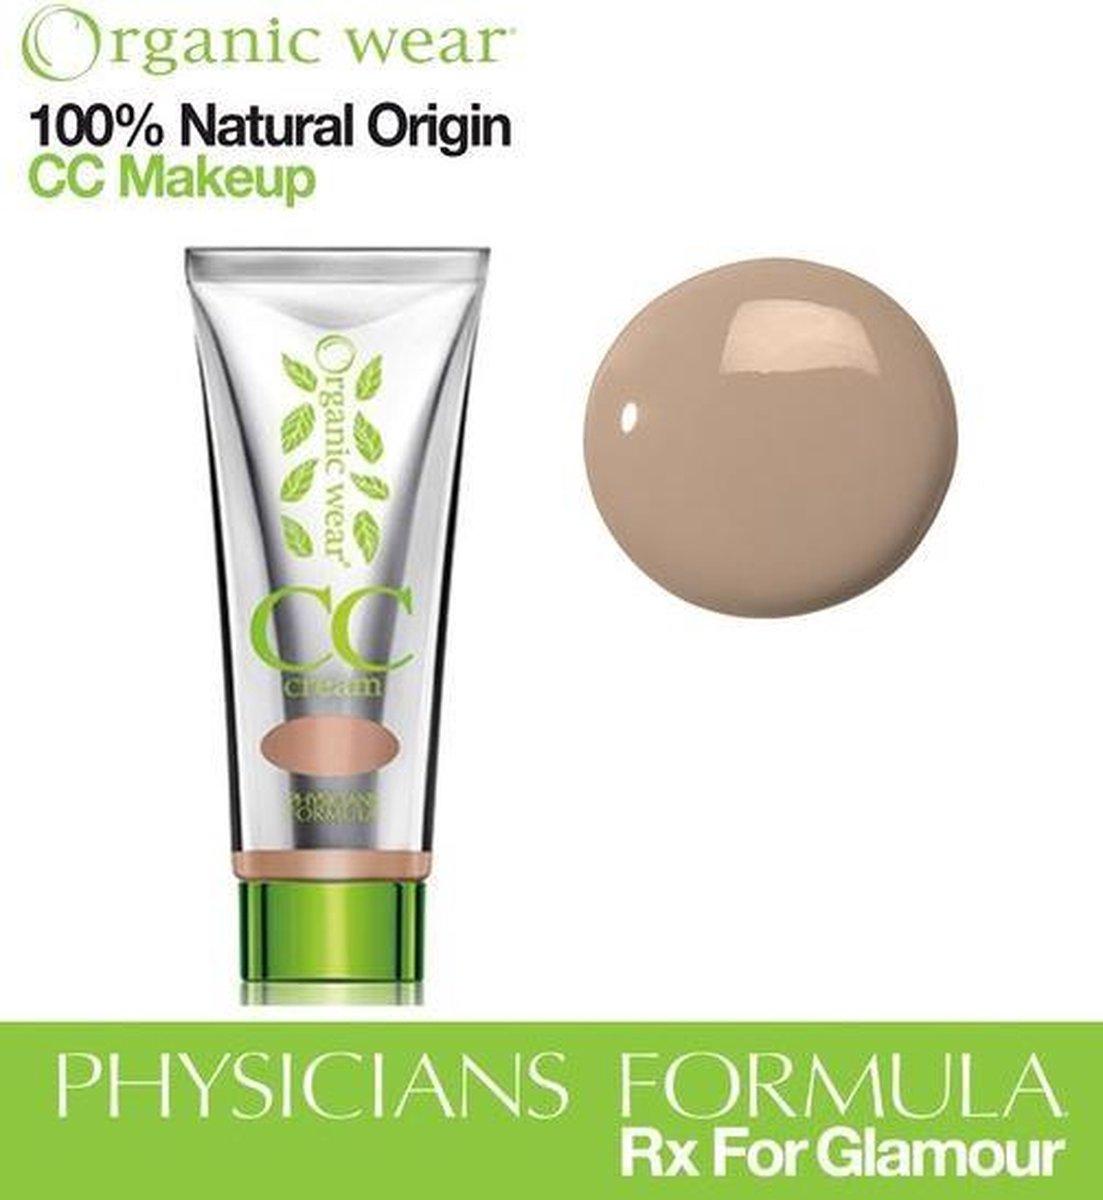 Physicians Formula Organic Wear 100